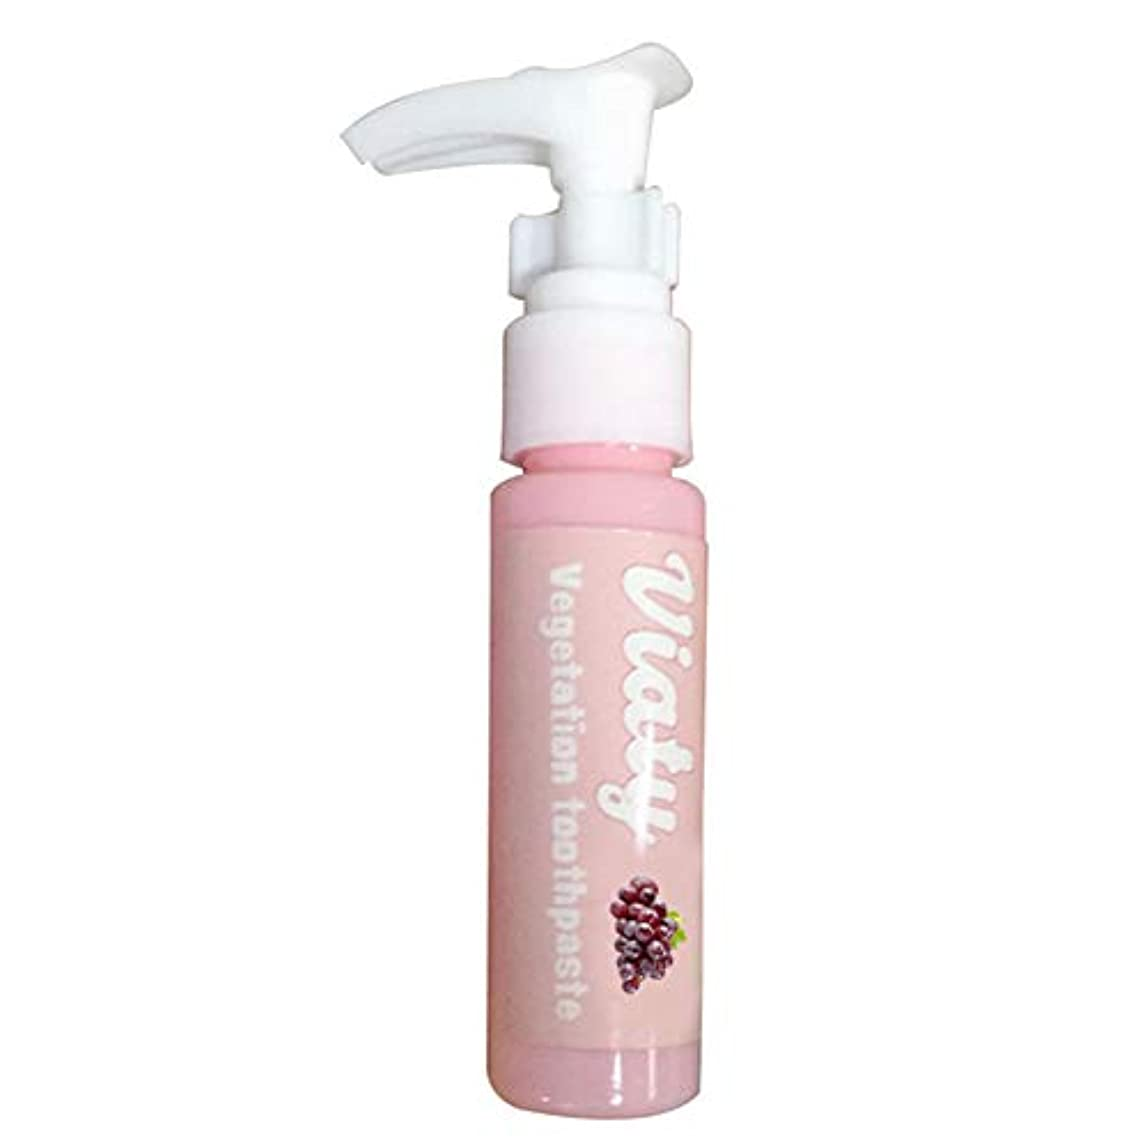 Aylincool 歯磨き粉を押す旅行ベーキングソーダを白くする装置のフルーティーなベーキングソーダ歯磨き粉